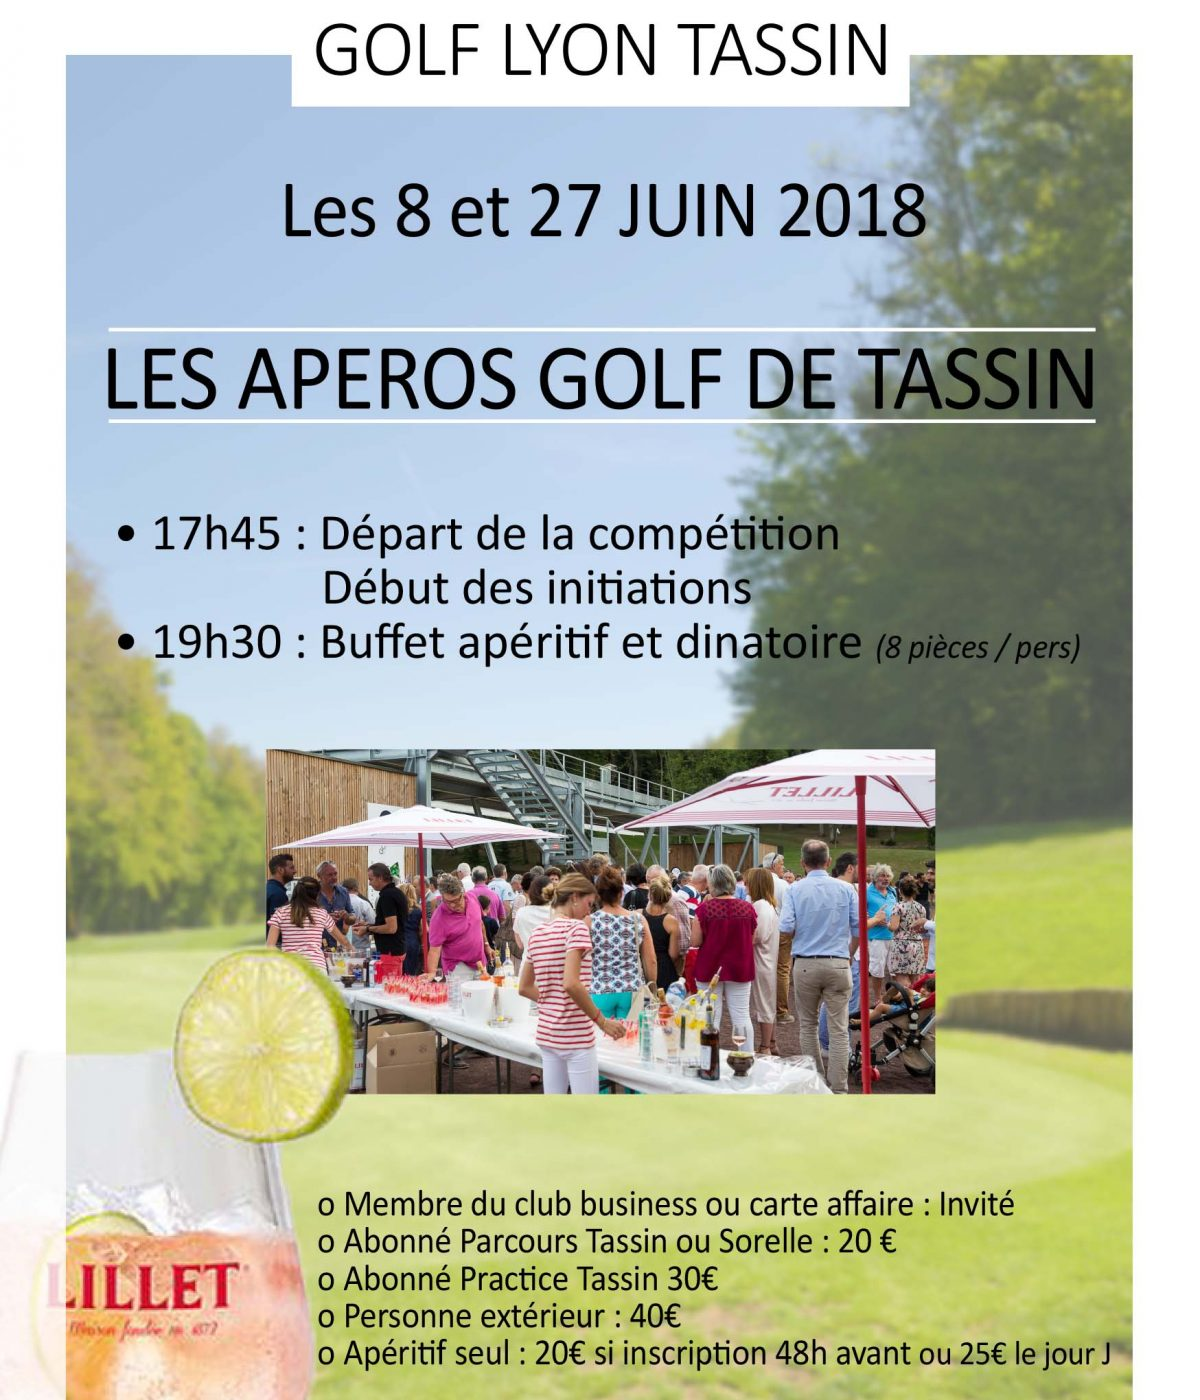 Apéros du golf de Lyon Tassin